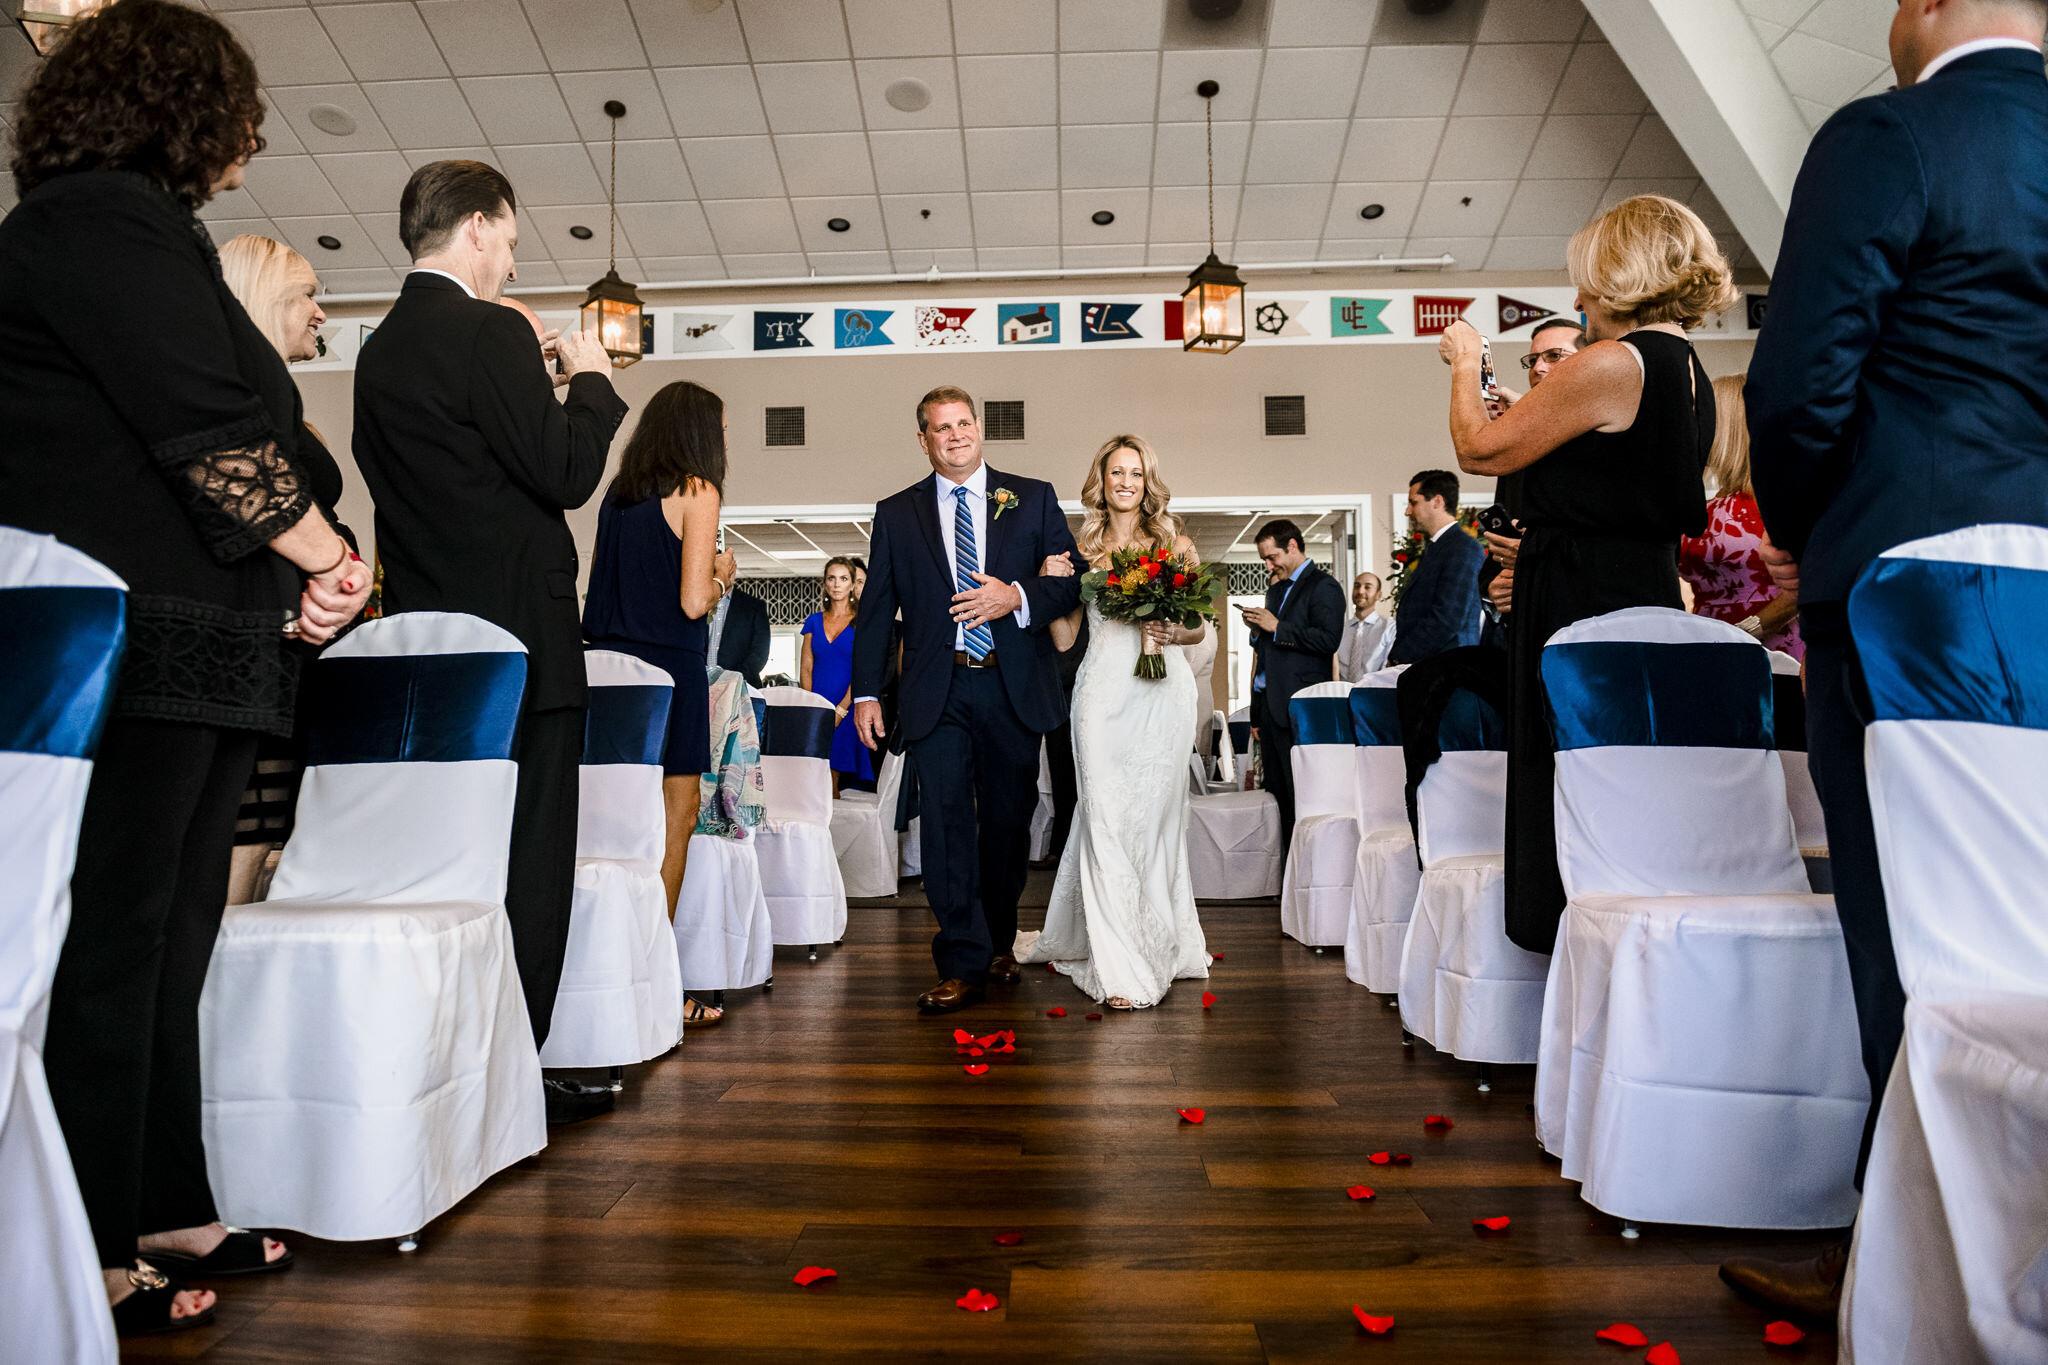 Snell-Ocean-City-Yacht-Club-New-Jersey-Wedding-Photographer-20.JPG